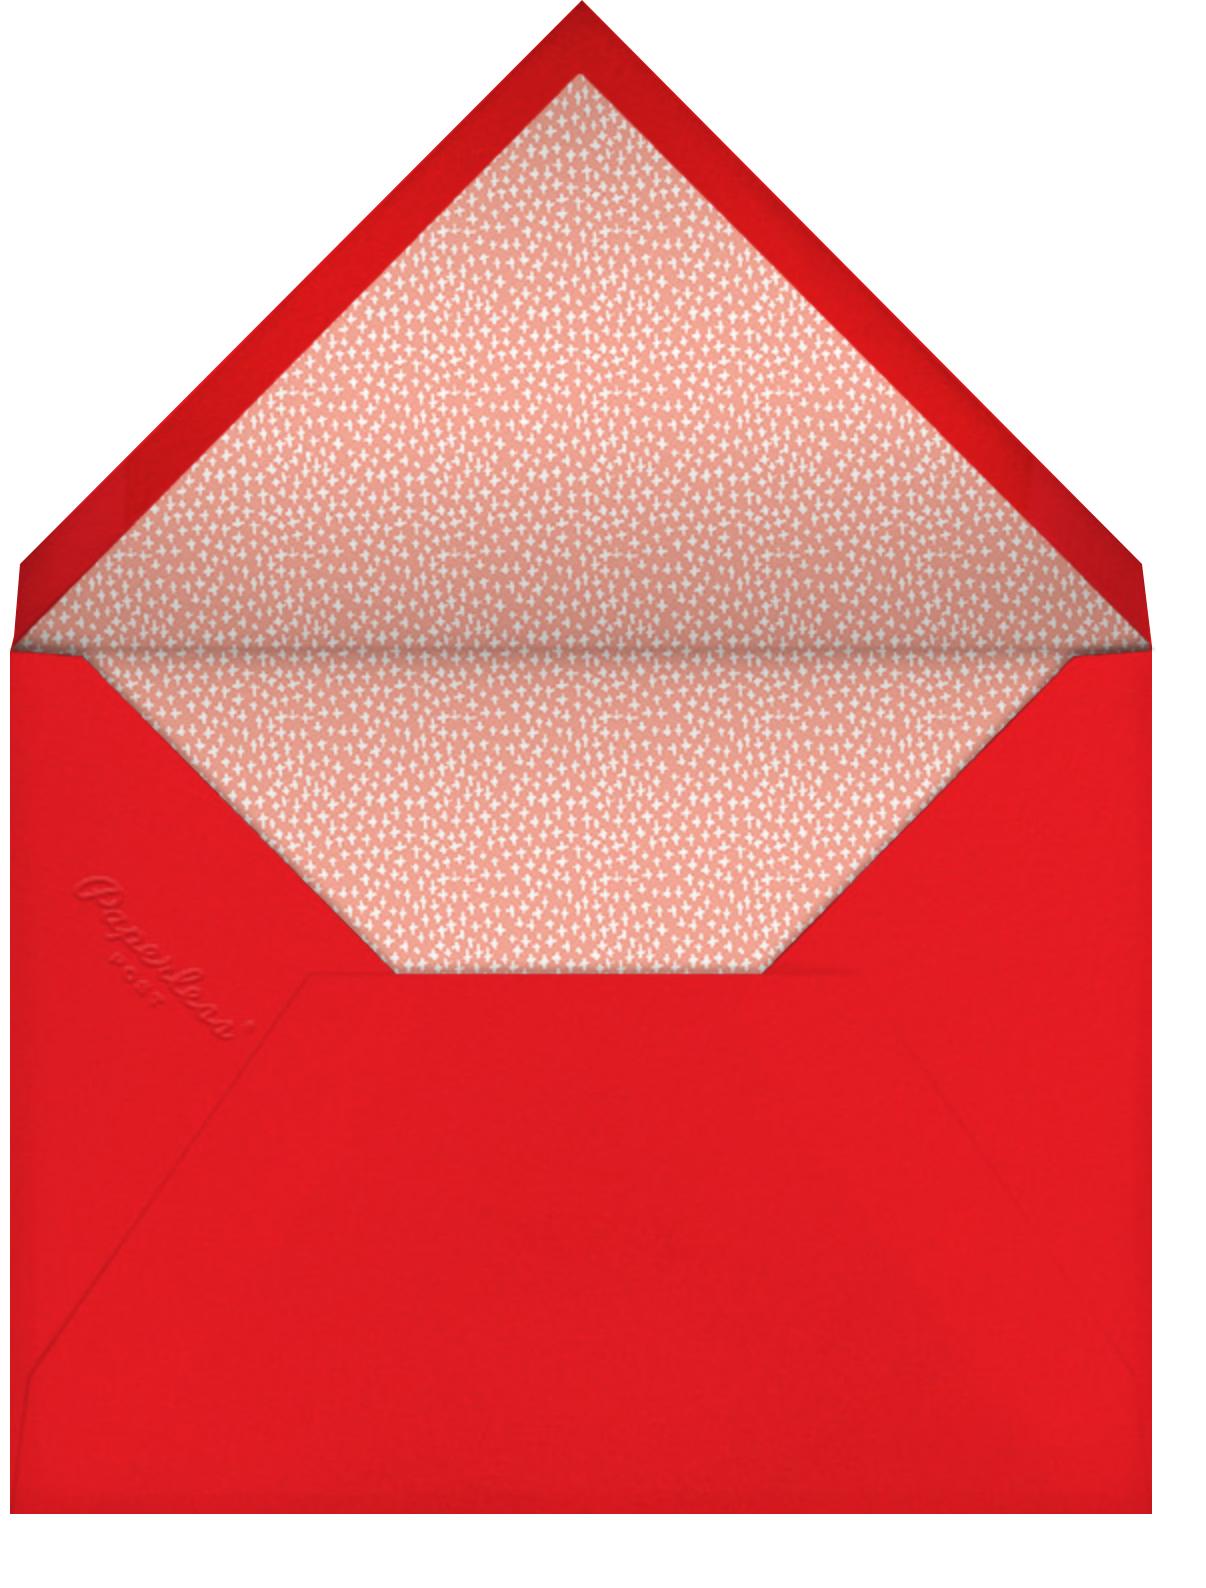 Love You a Brunch - Fair/Medium - Mr. Boddington's Studio - Valentine's Day - envelope back